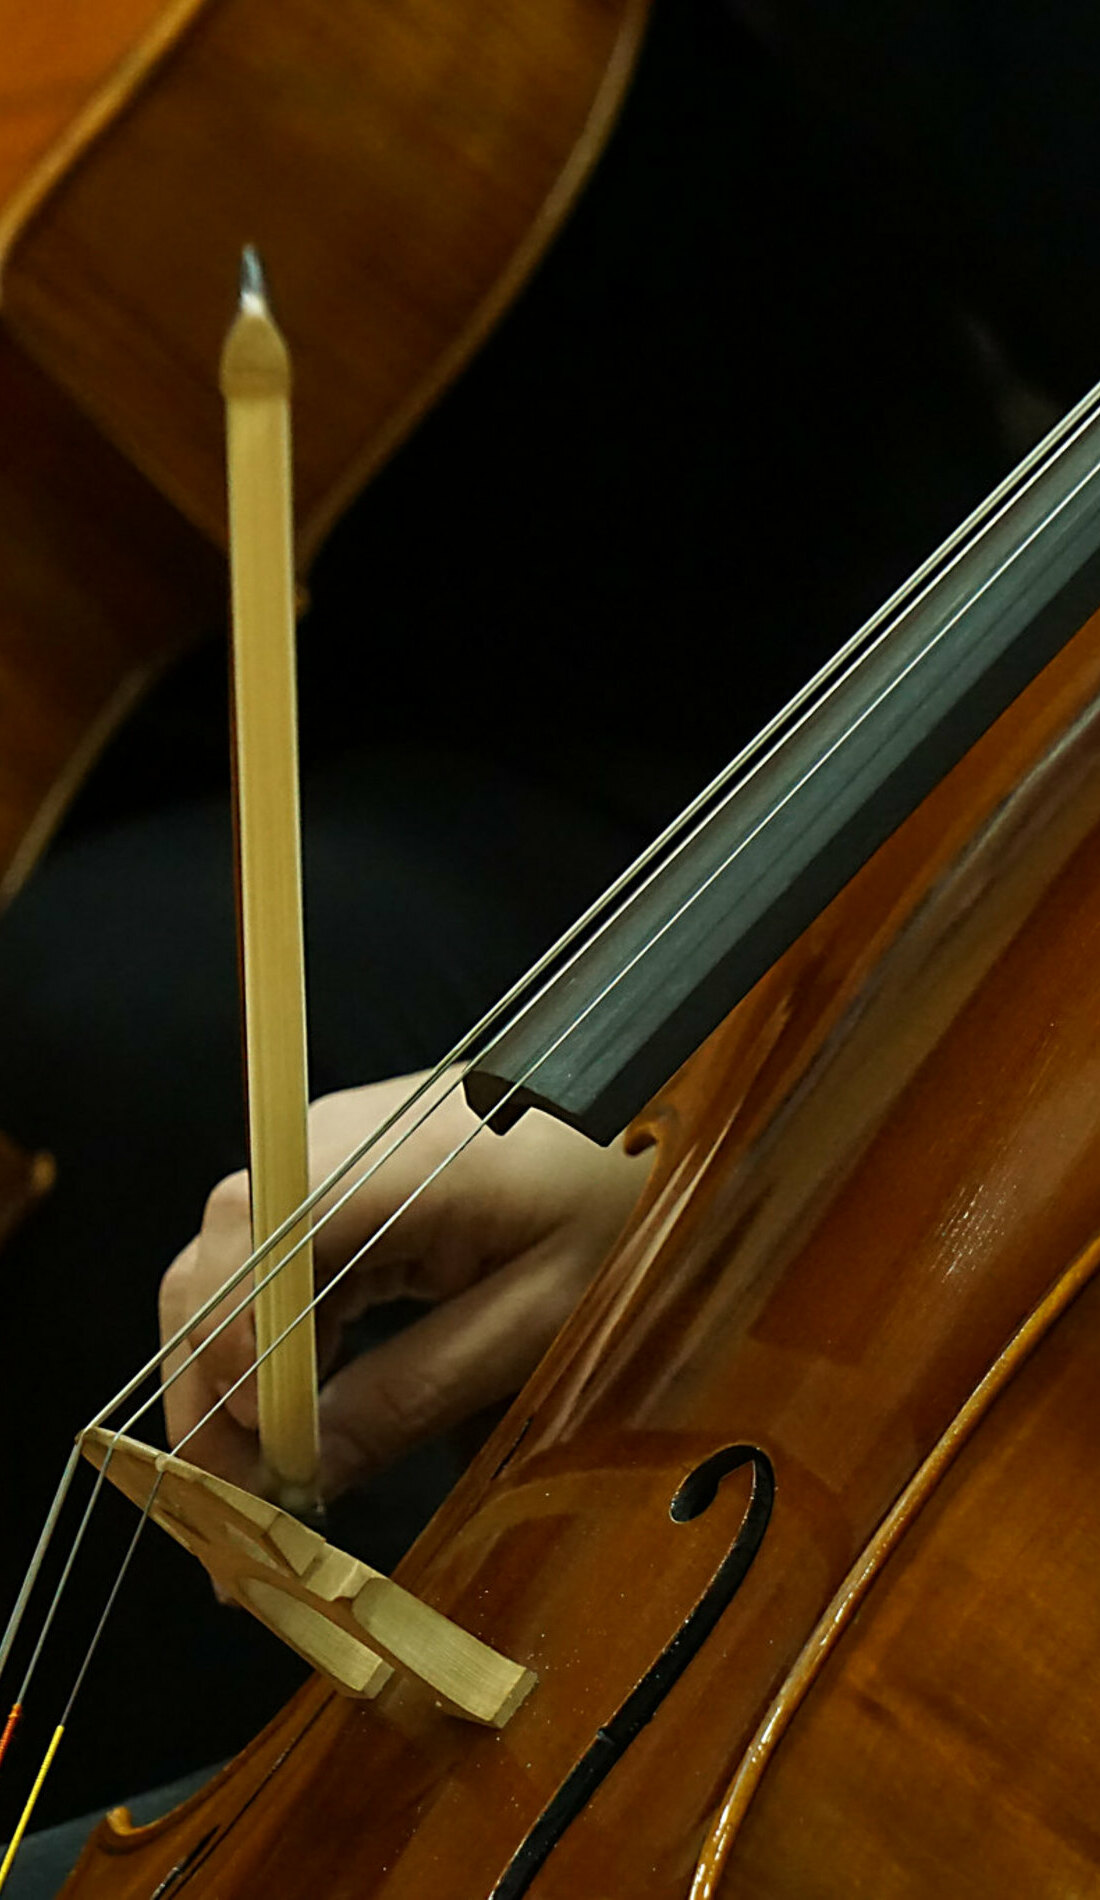 A Memphis Symphony Orchestra live event